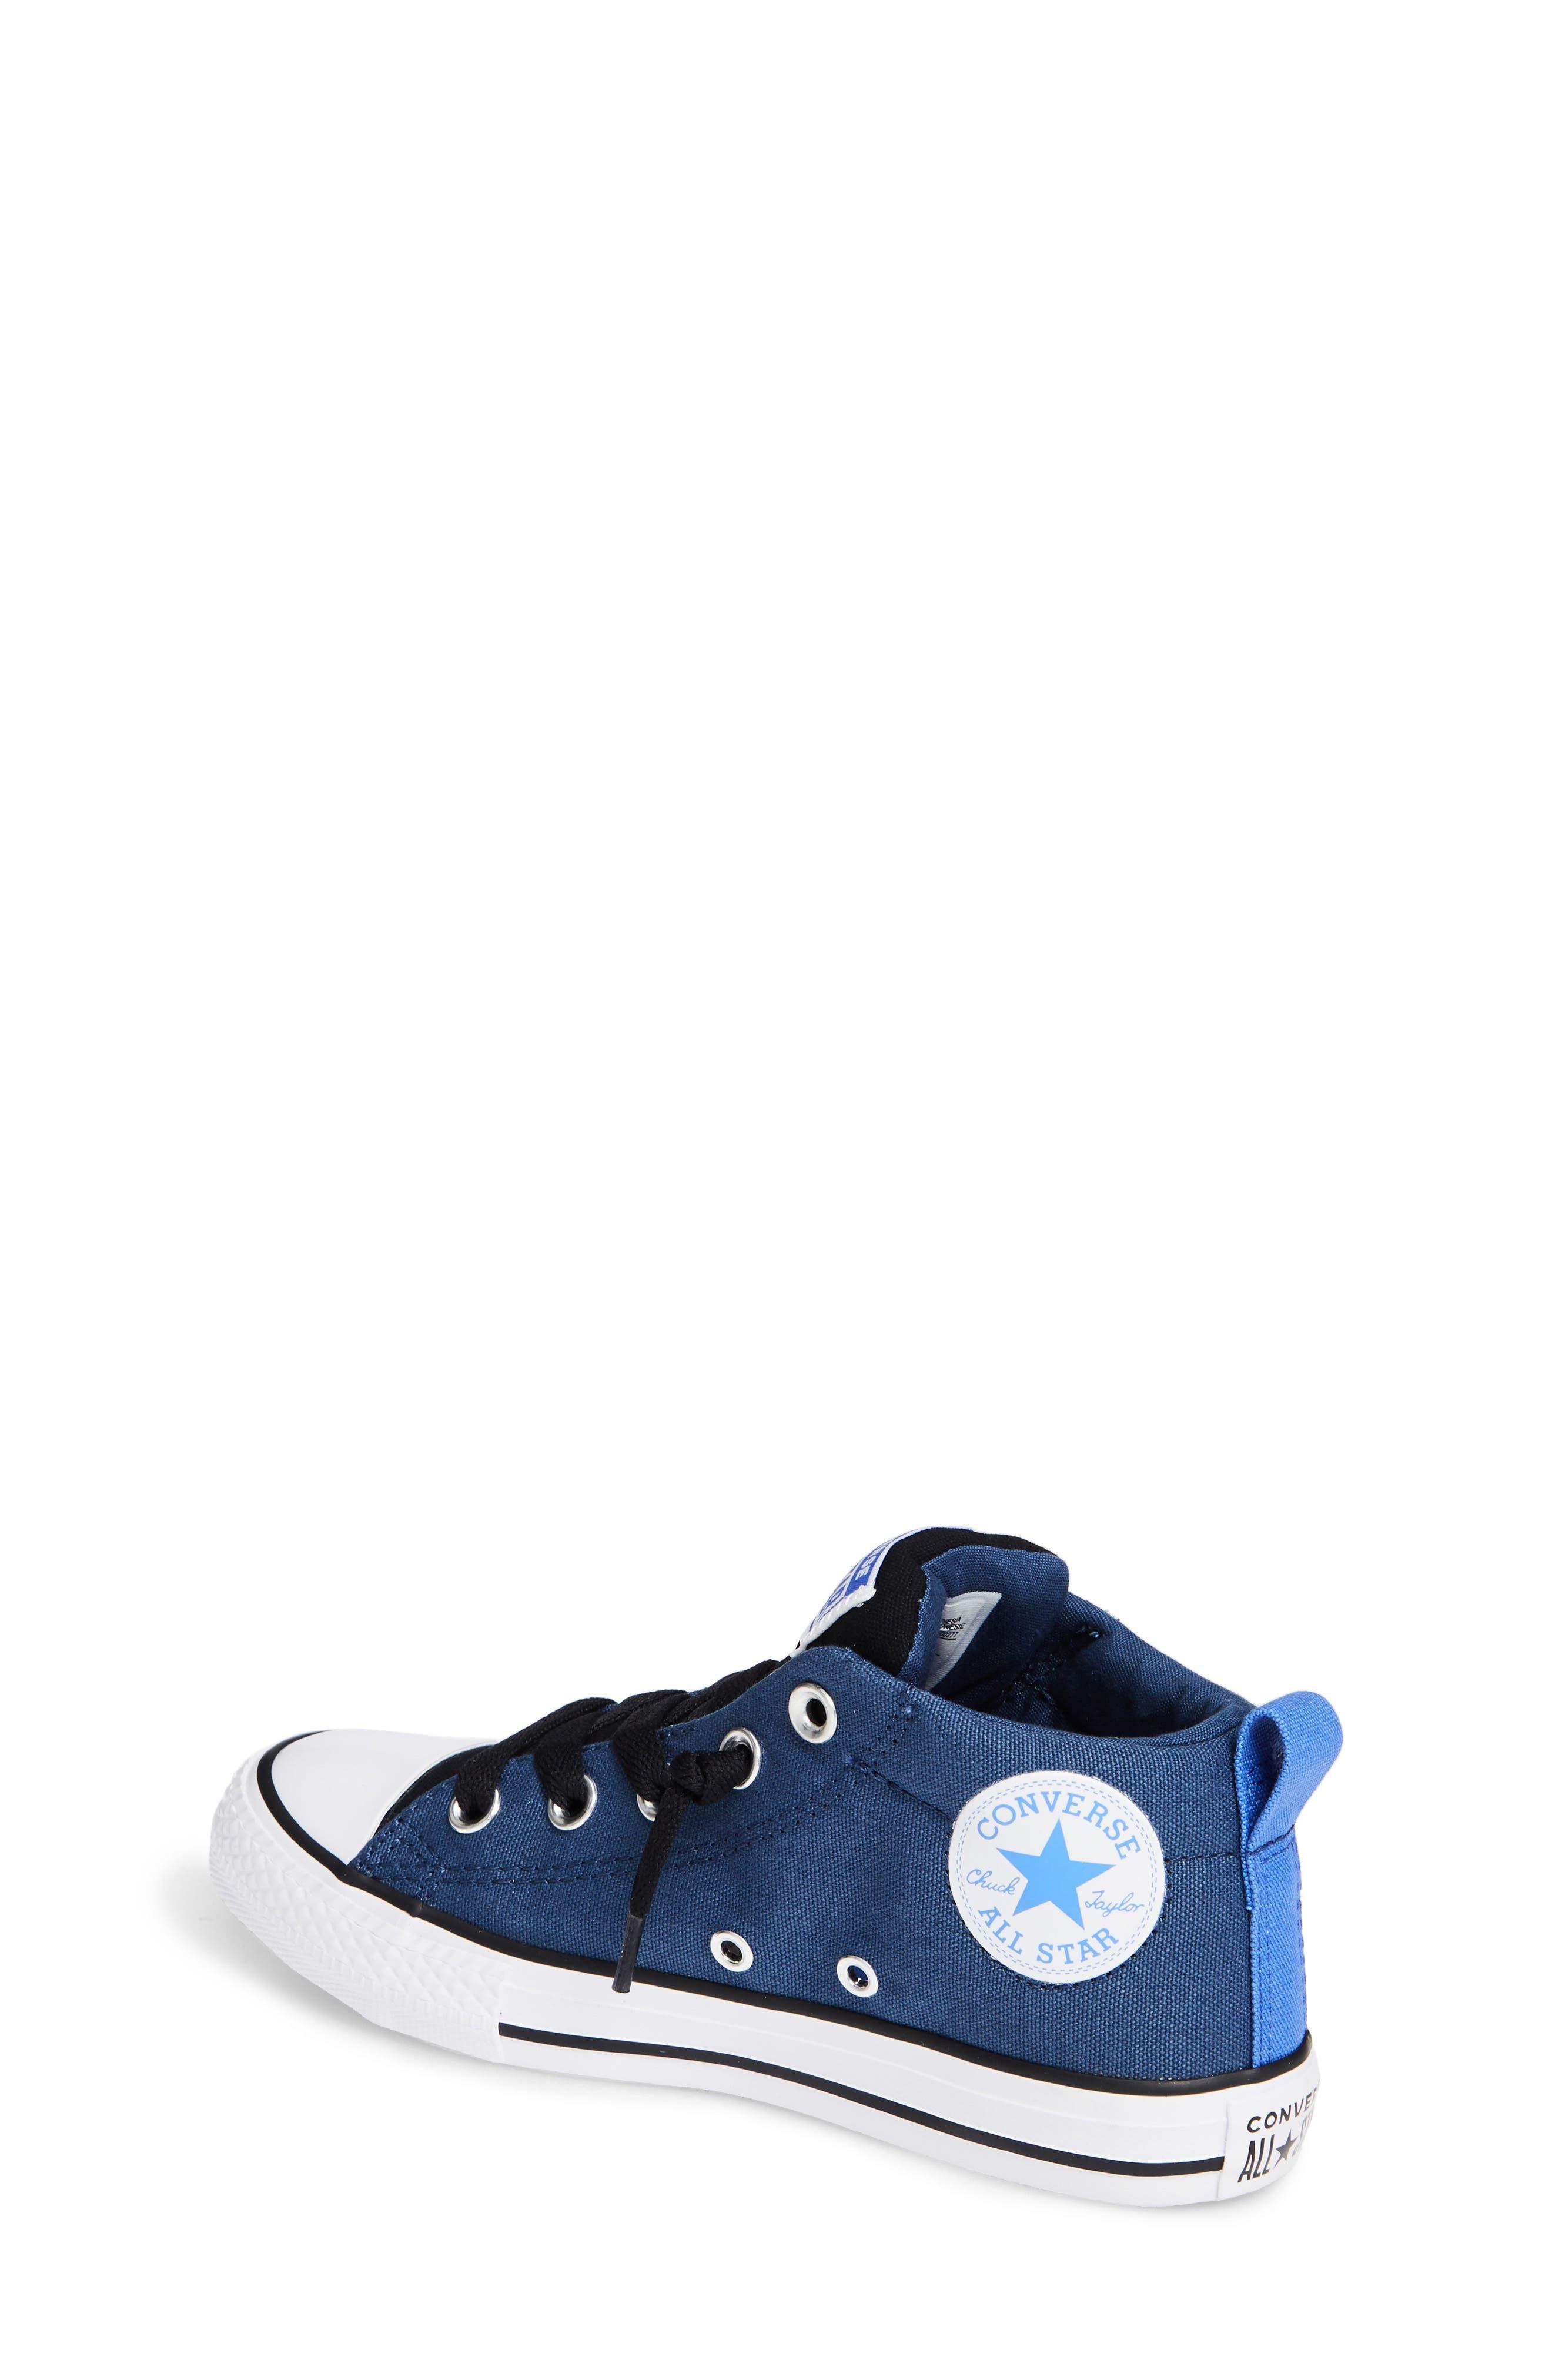 CONVERSE,                             Chuck Taylor<sup>®</sup> All Star<sup>®</sup> Seasonal Street Sneaker,                             Alternate thumbnail 2, color,                             403